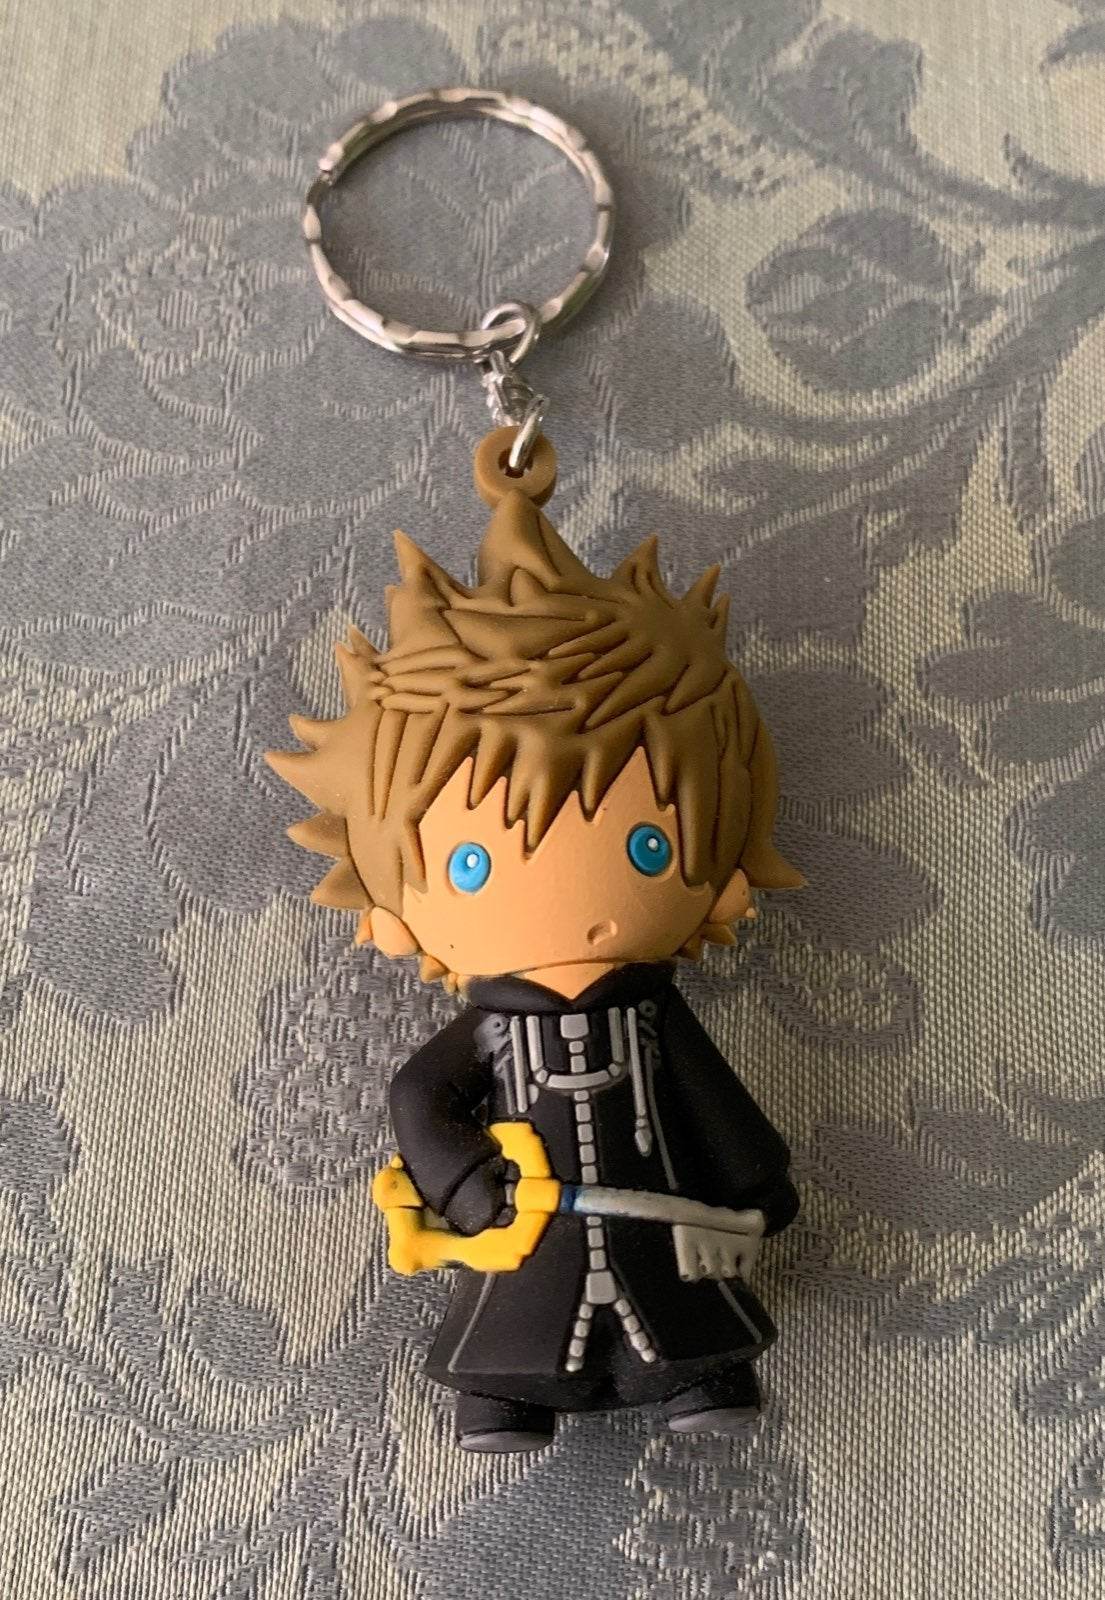 Kingdom Hearts Series 3 Roxas Keychain